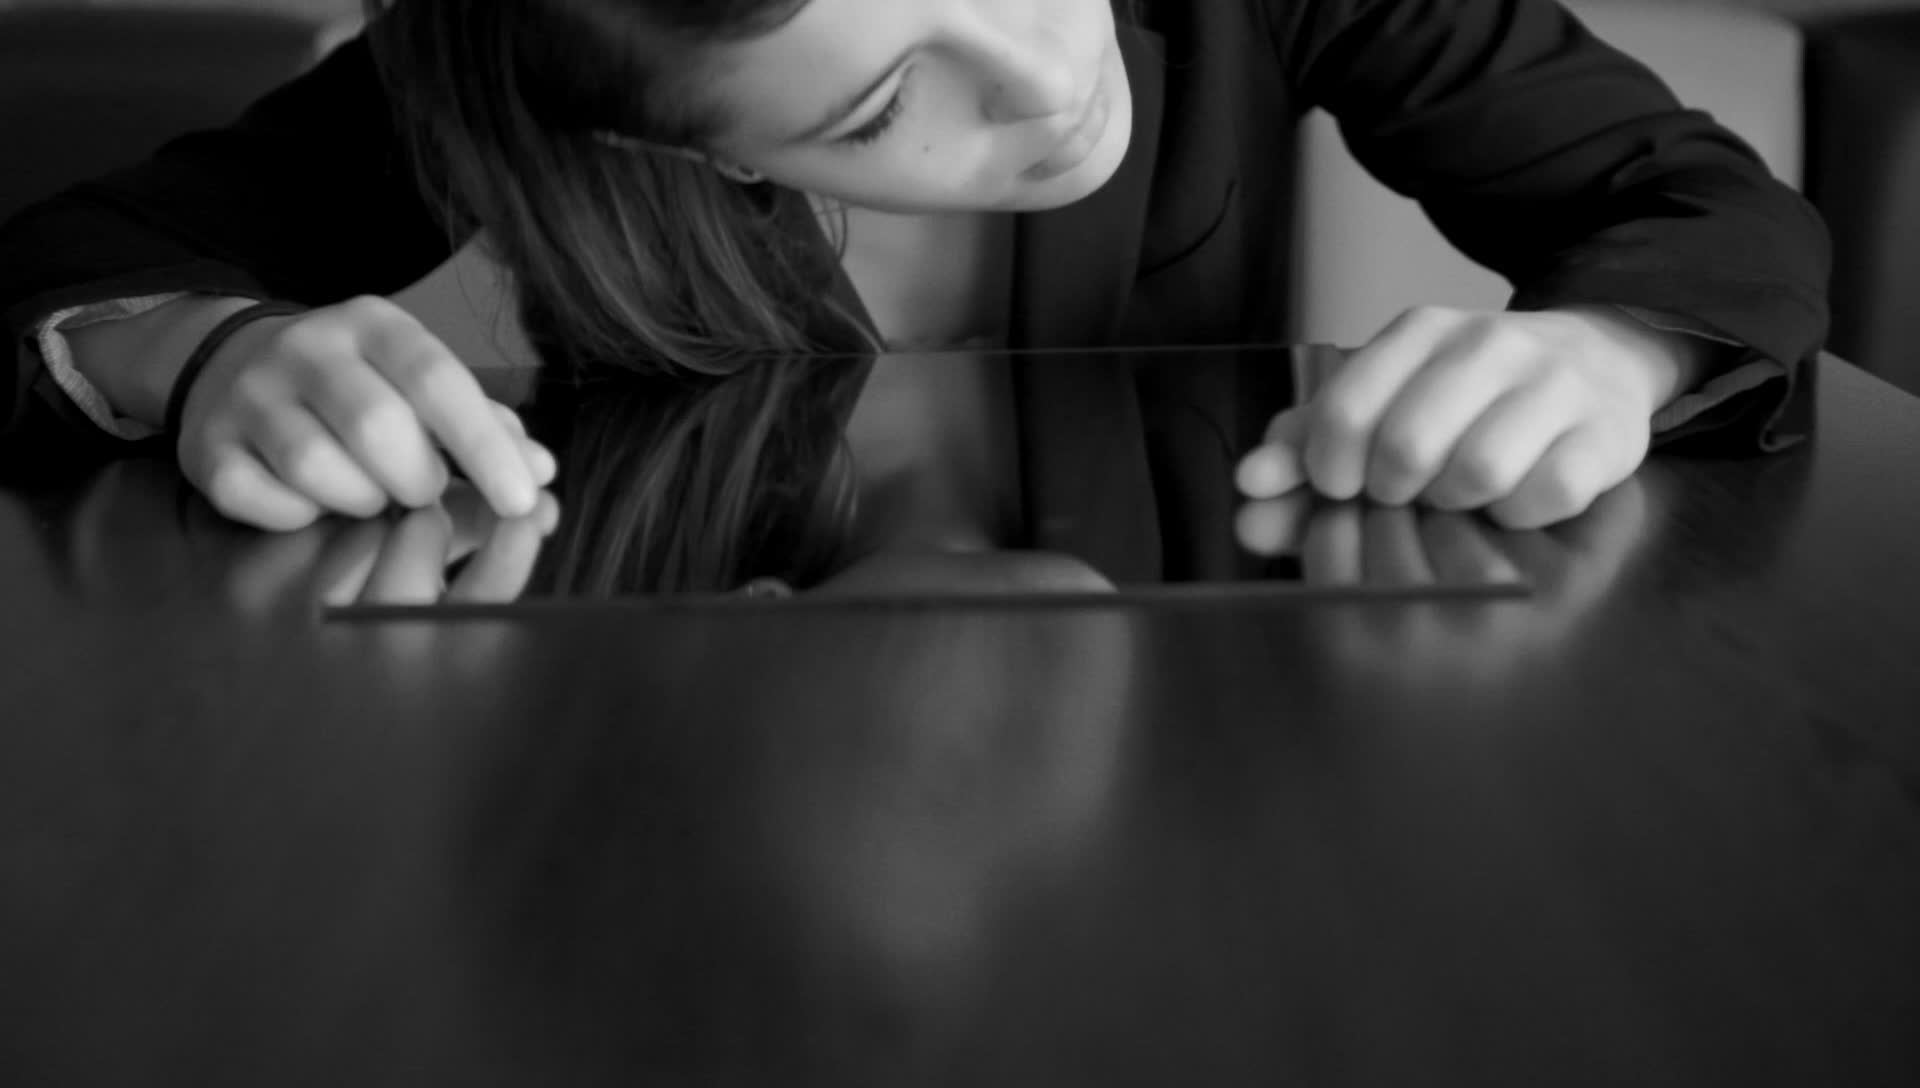 Hilary Hahn, Sink aus dem Album Silfra